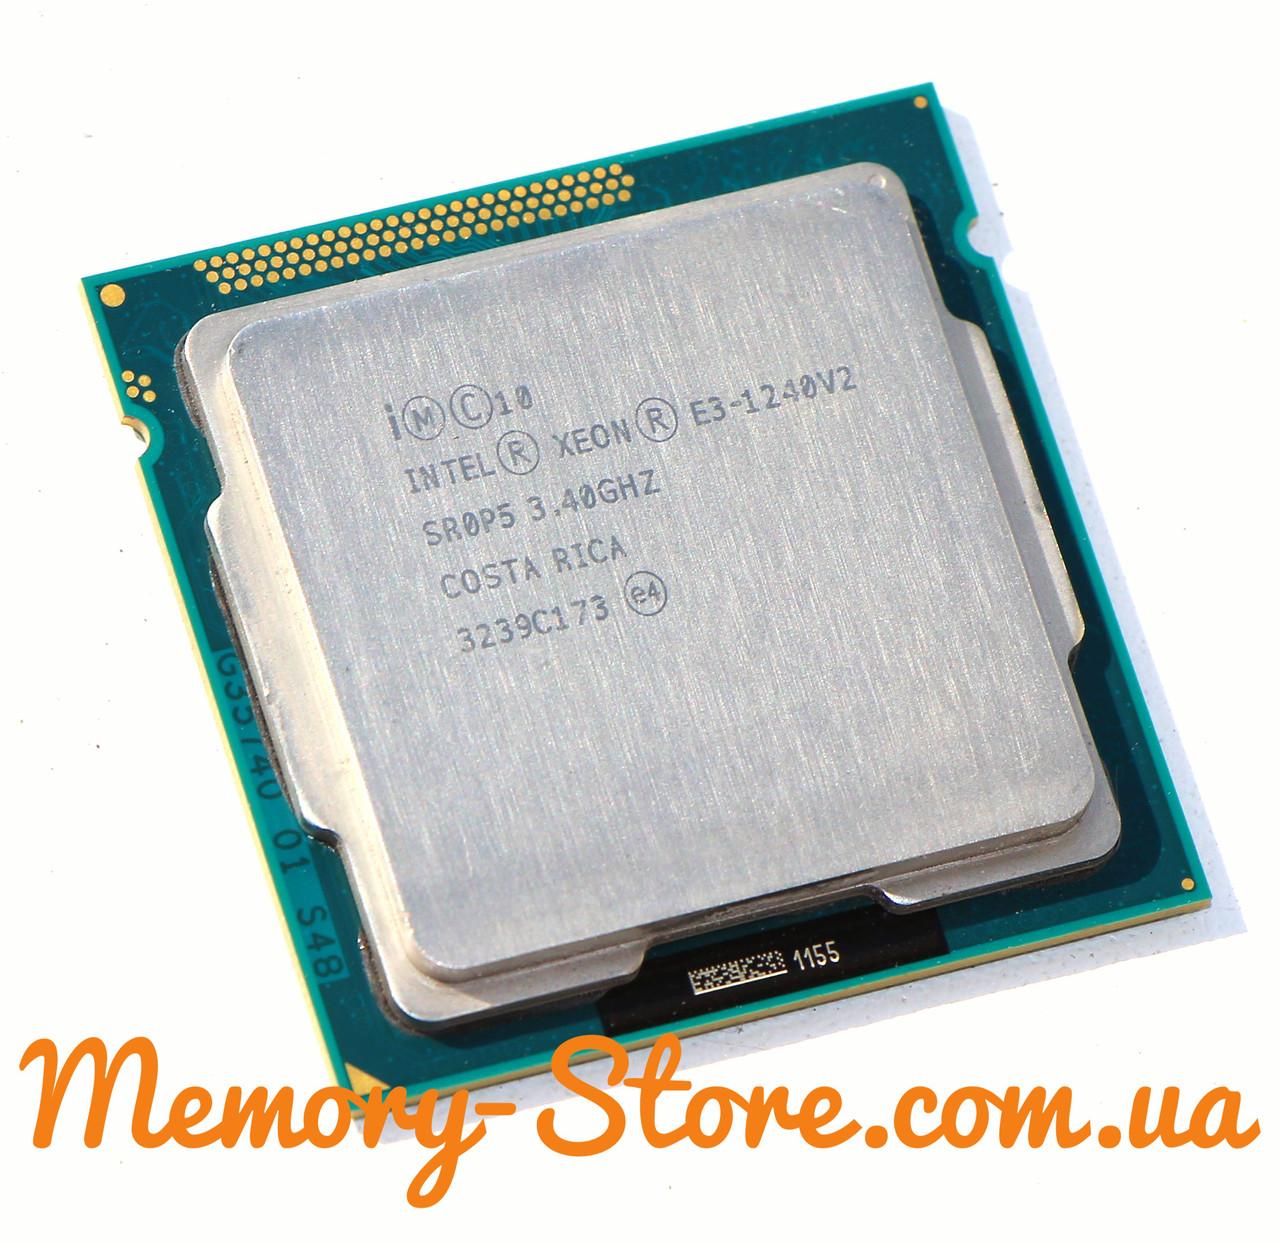 Процессор Intel® Xeon® E3-1240 v2 LGA1155 up to 3.80GHz ( i7-3770)